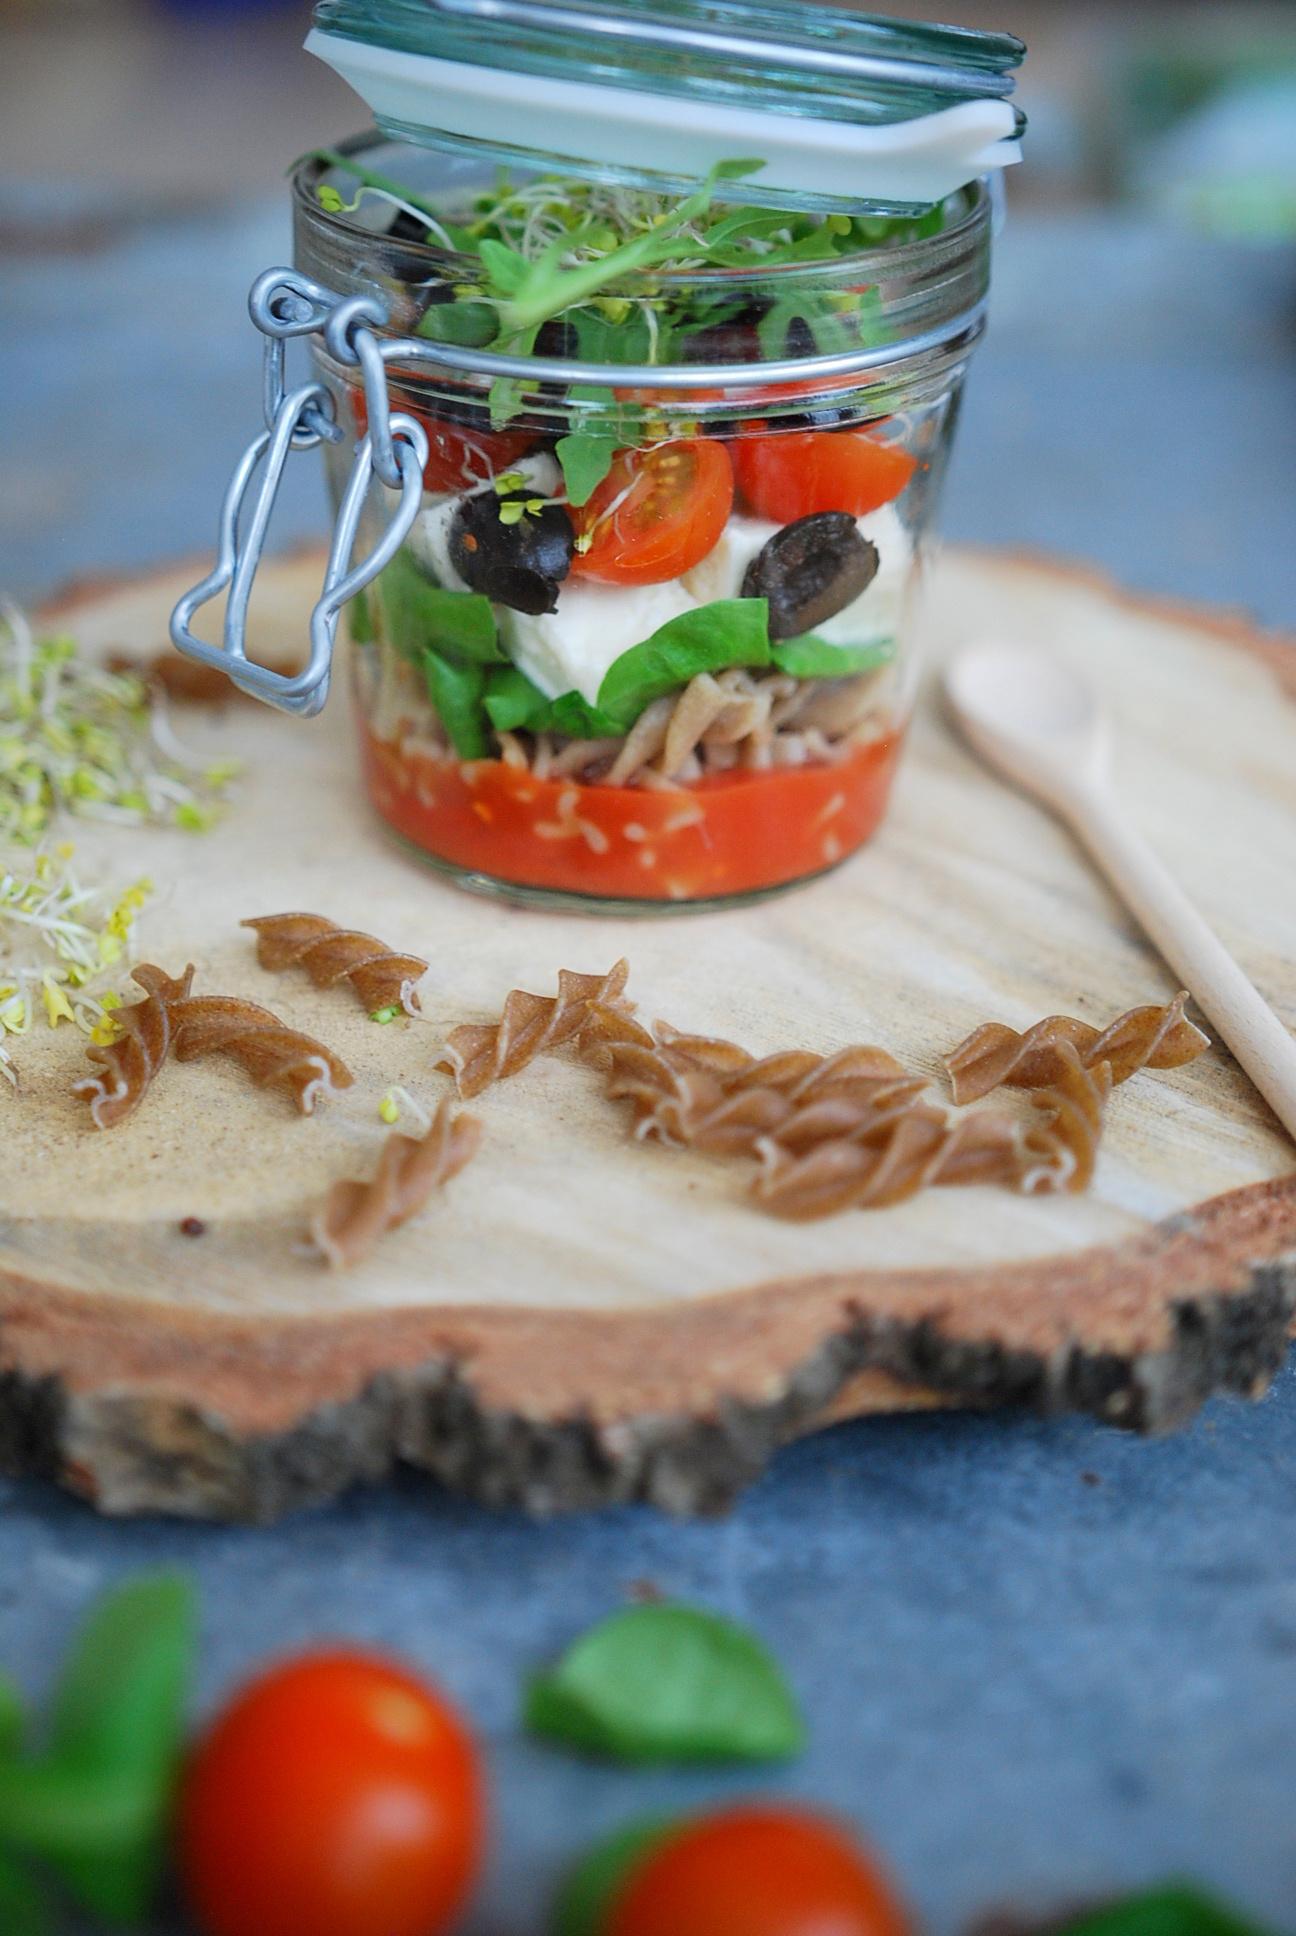 salatka-w-sloiku-lunch-box